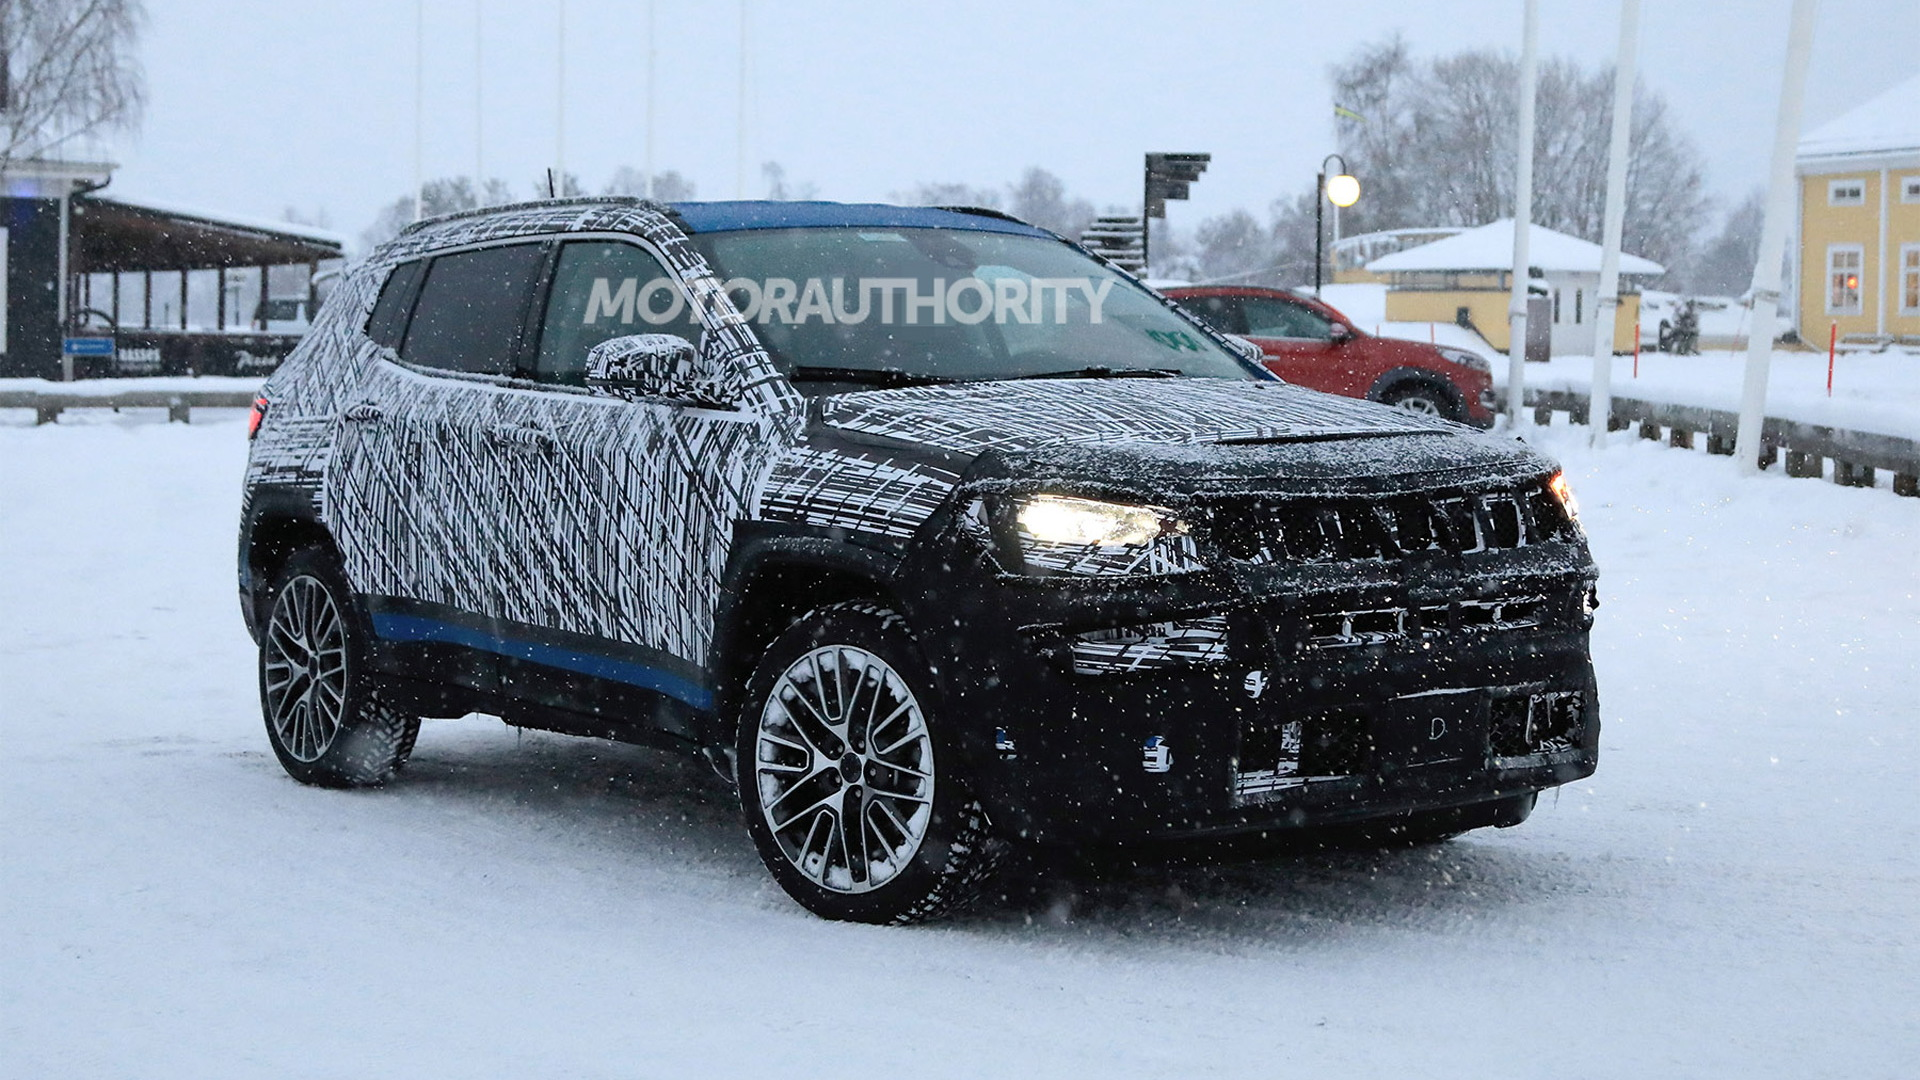 2022 Jeep Compass facelift spy shots - Photo credit:S. Baldauf/SB-Medien